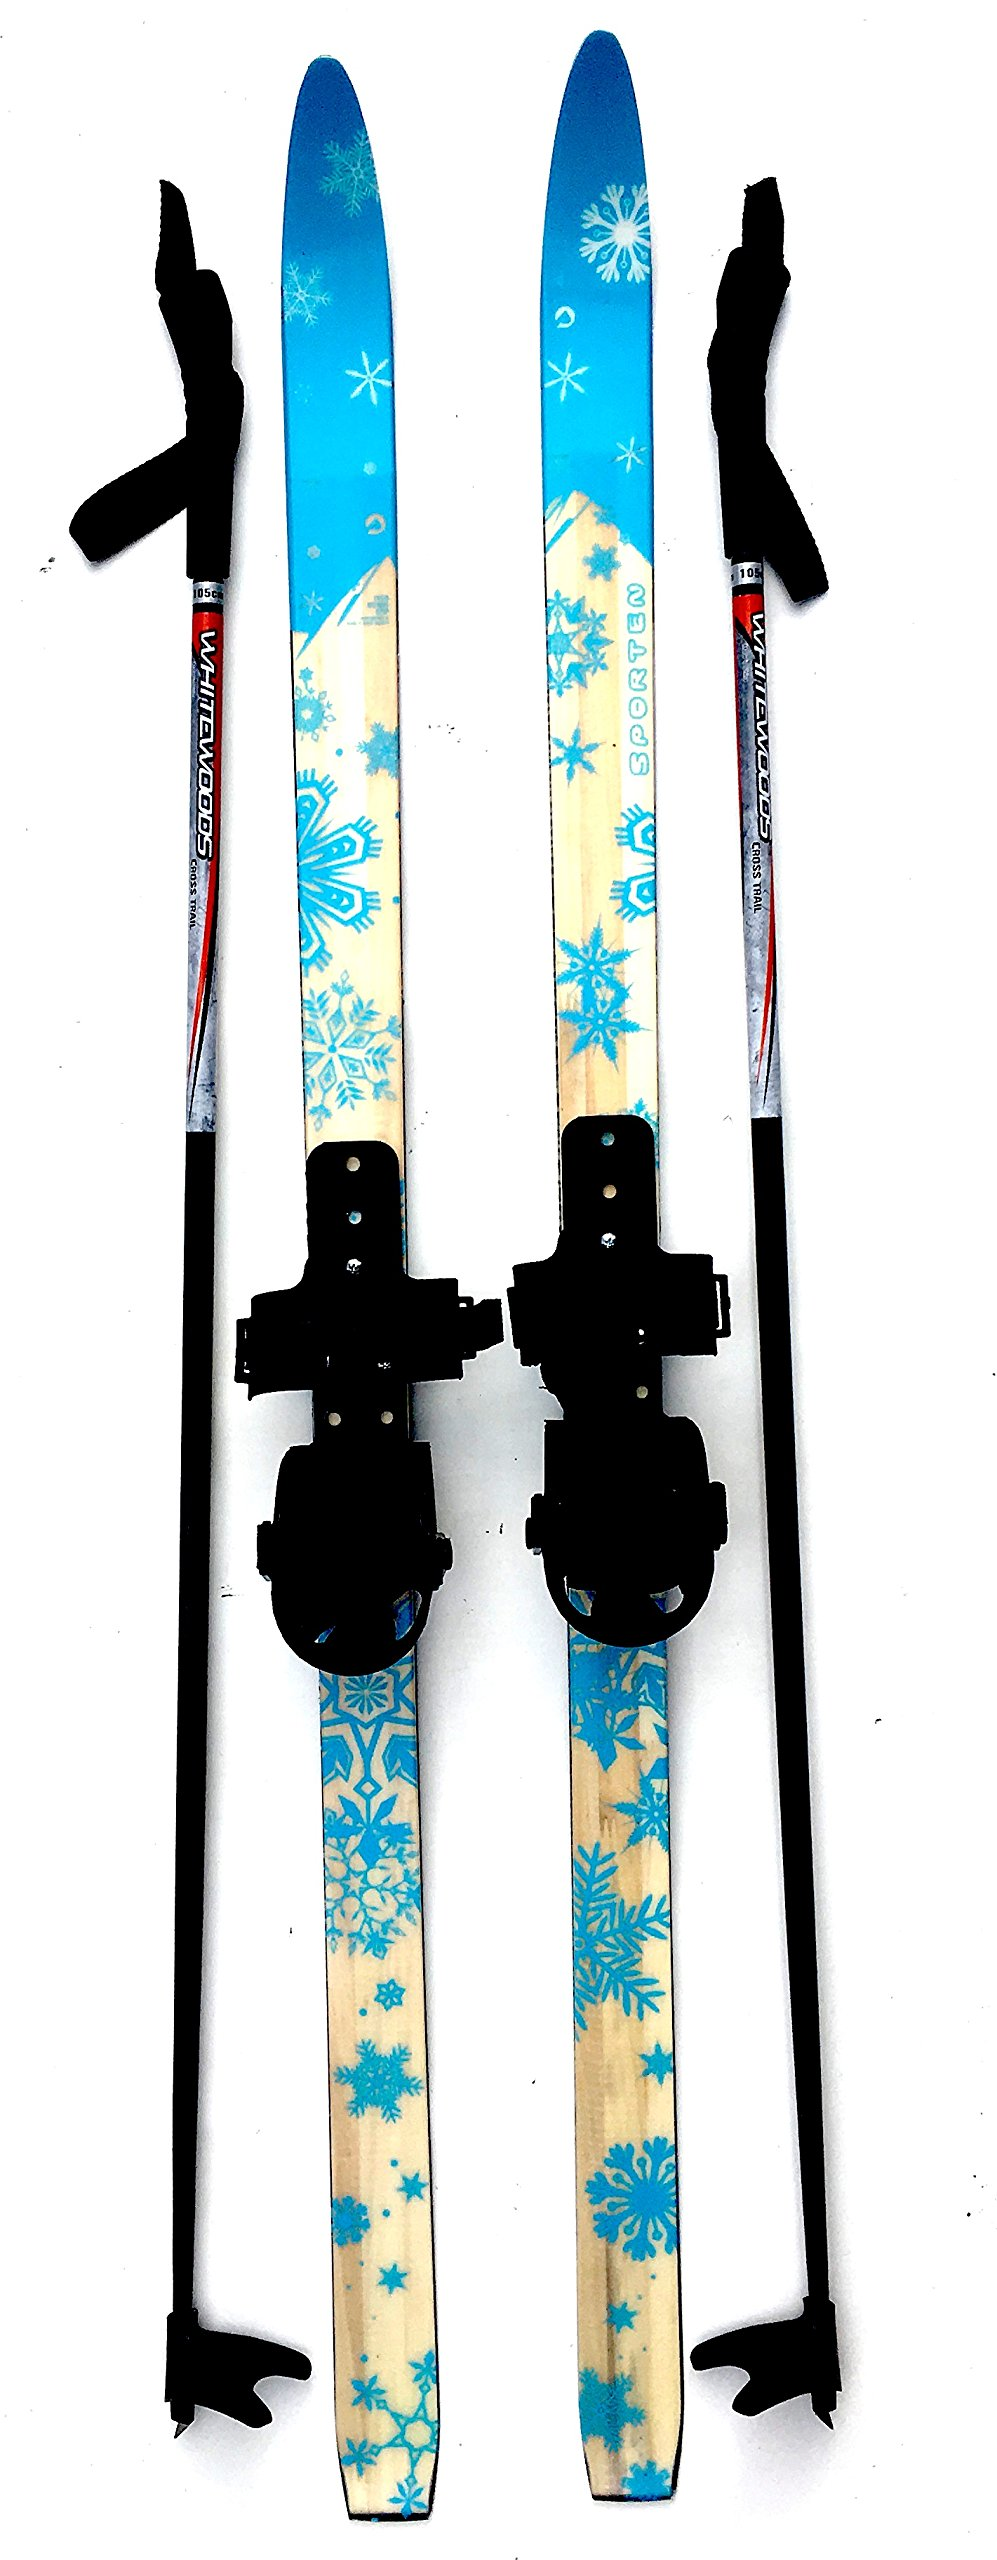 Sporten Second Step Beginner Kids Junior Cross Country Skis 120cm Adjustable Universal Bindings Poles by sporten